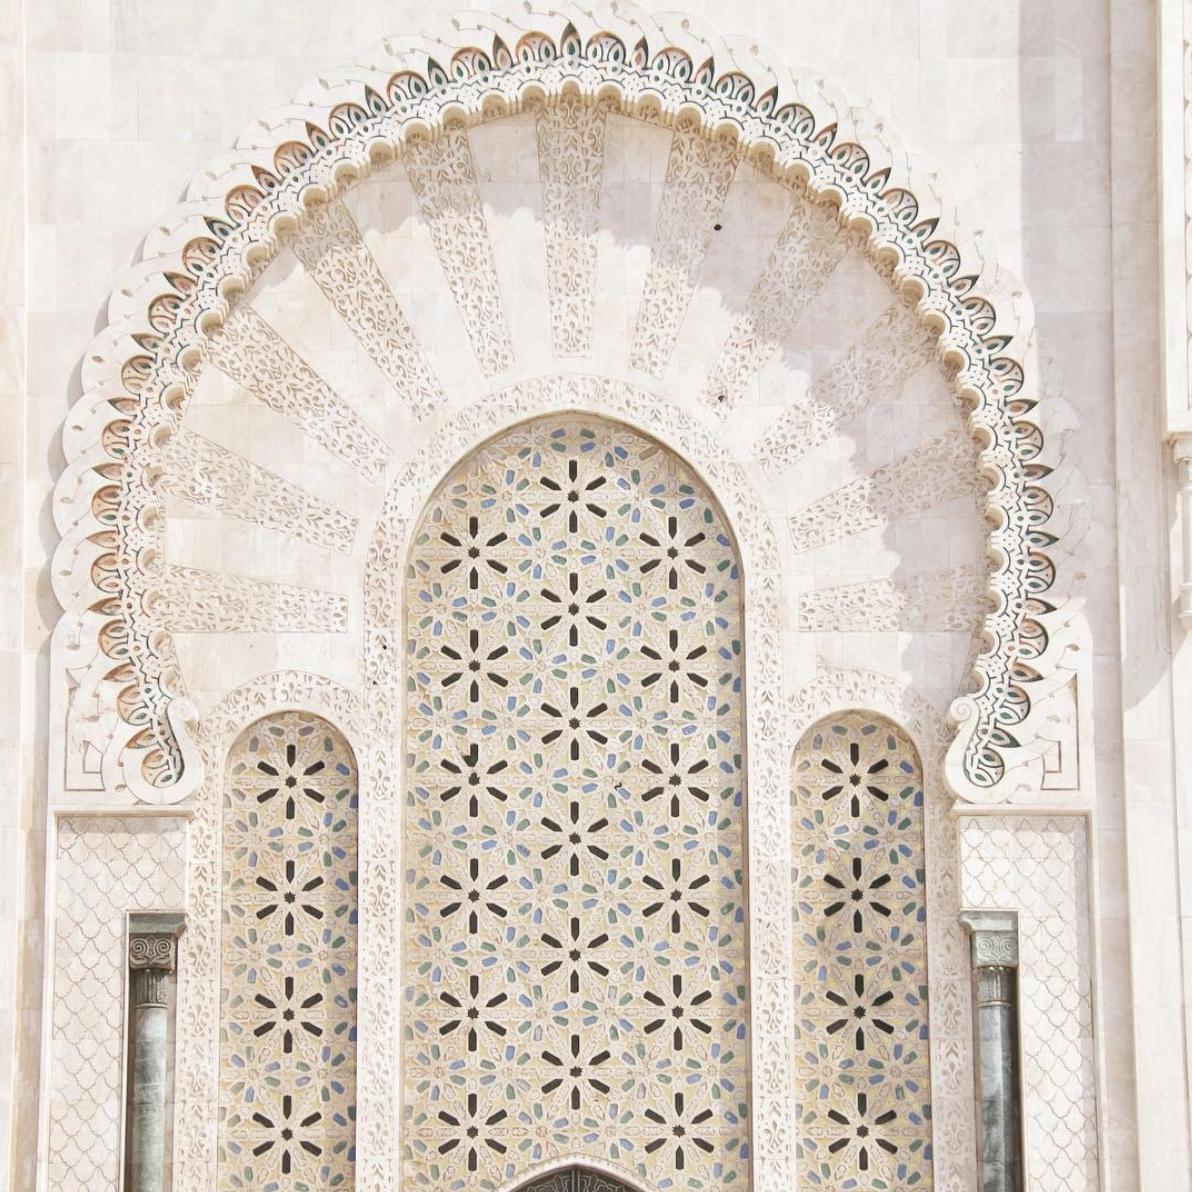 Travel Morocco Souk & Co.